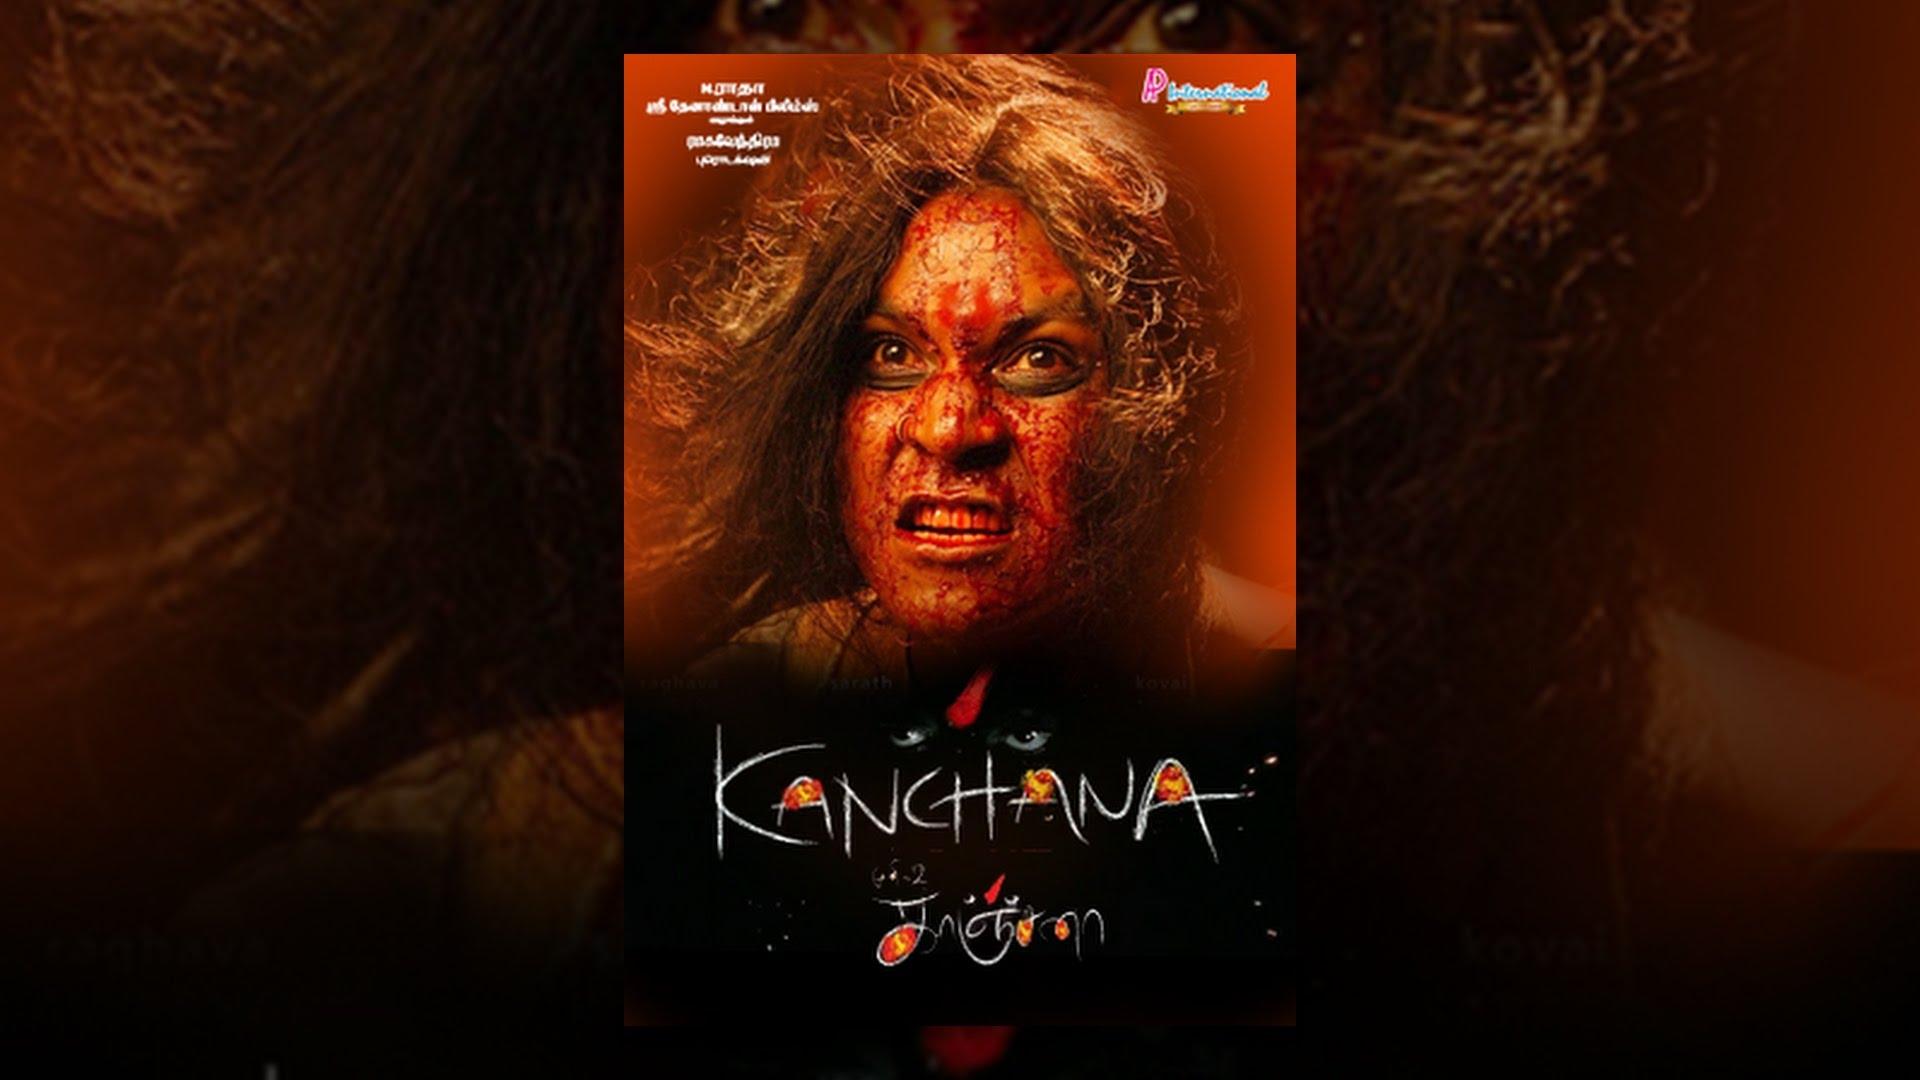 Download Muni 2 Kanchana